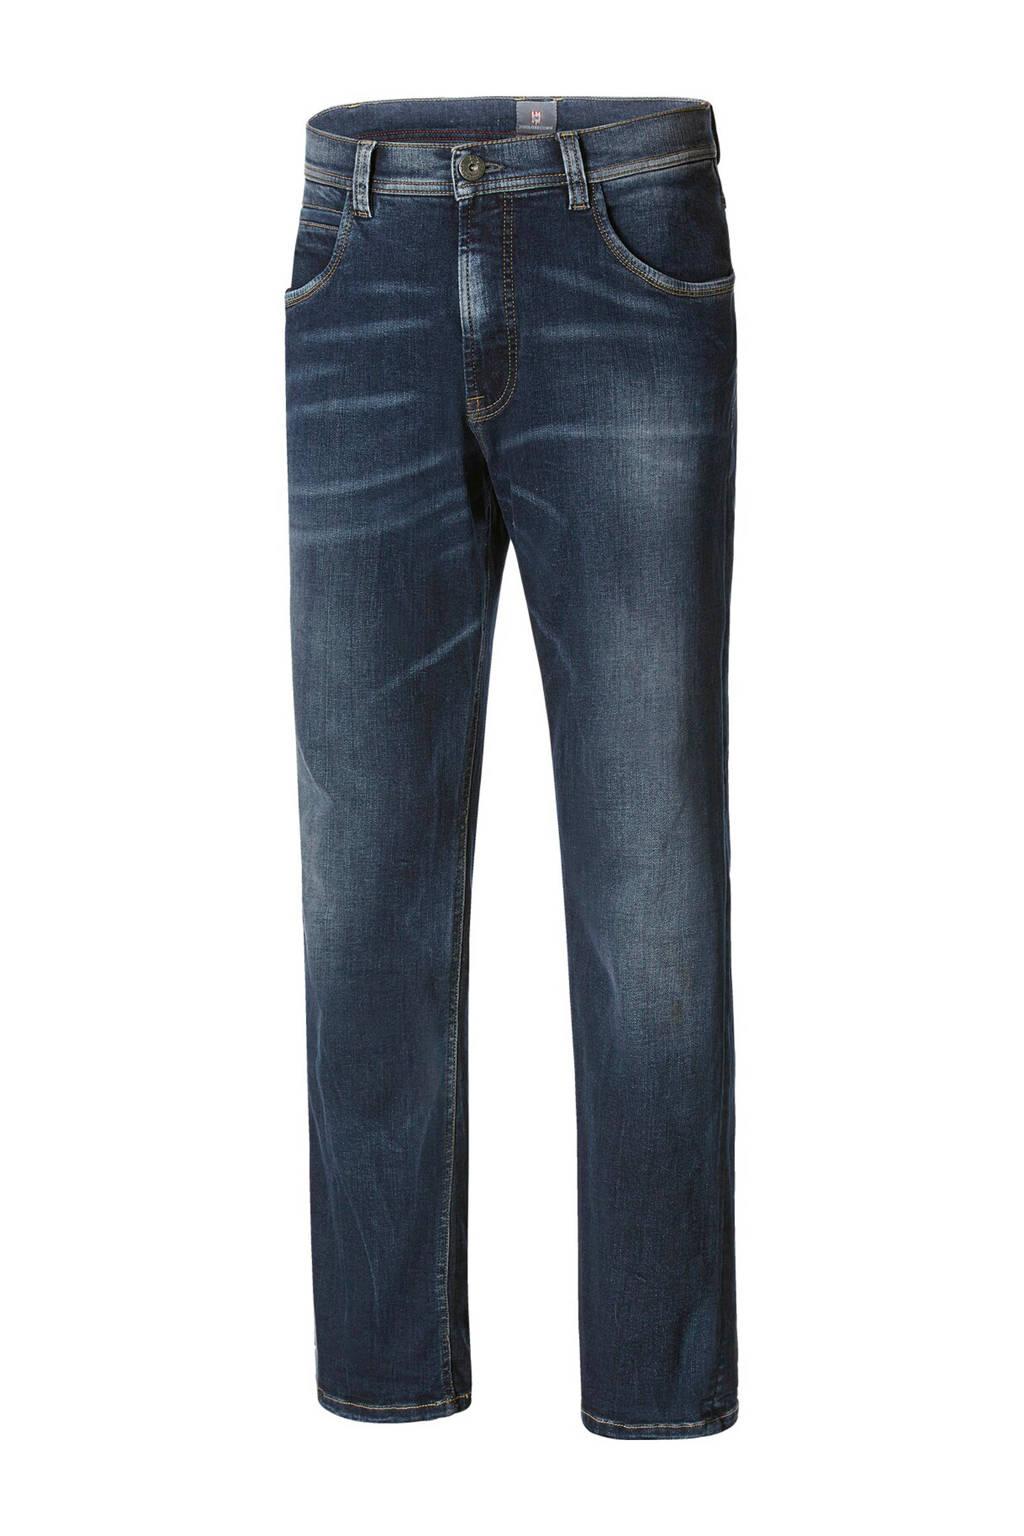 Jan Vanderstorm straight fit jeans Plus Size WICKIE dark denim, Dark denim